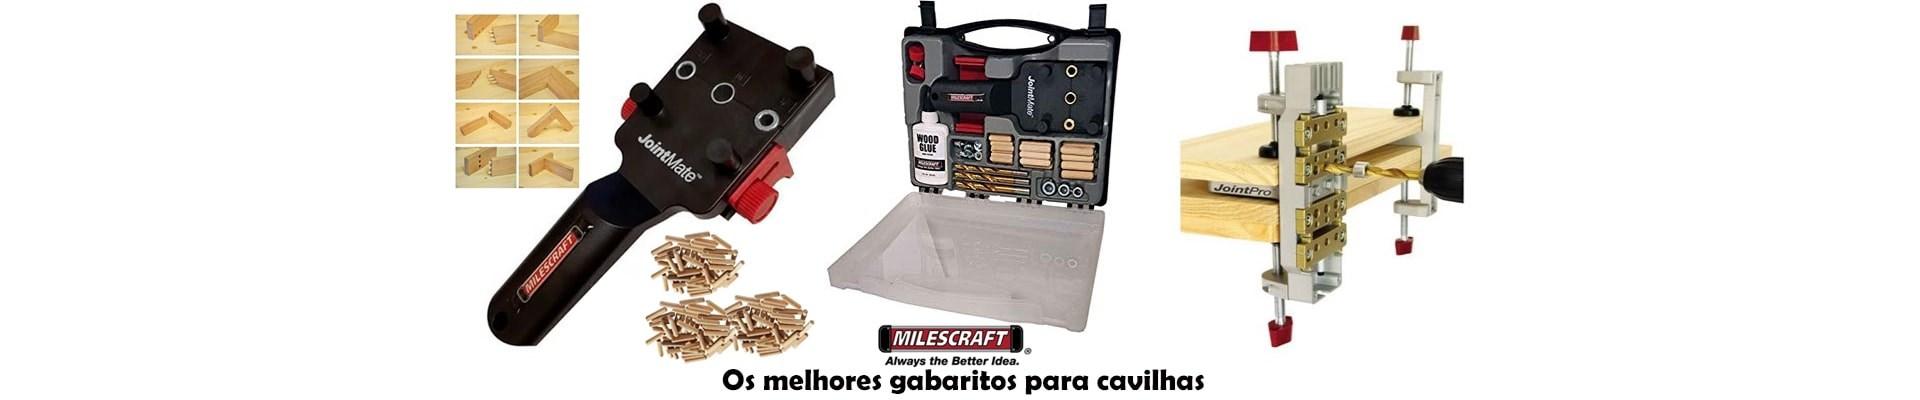 Milescraft